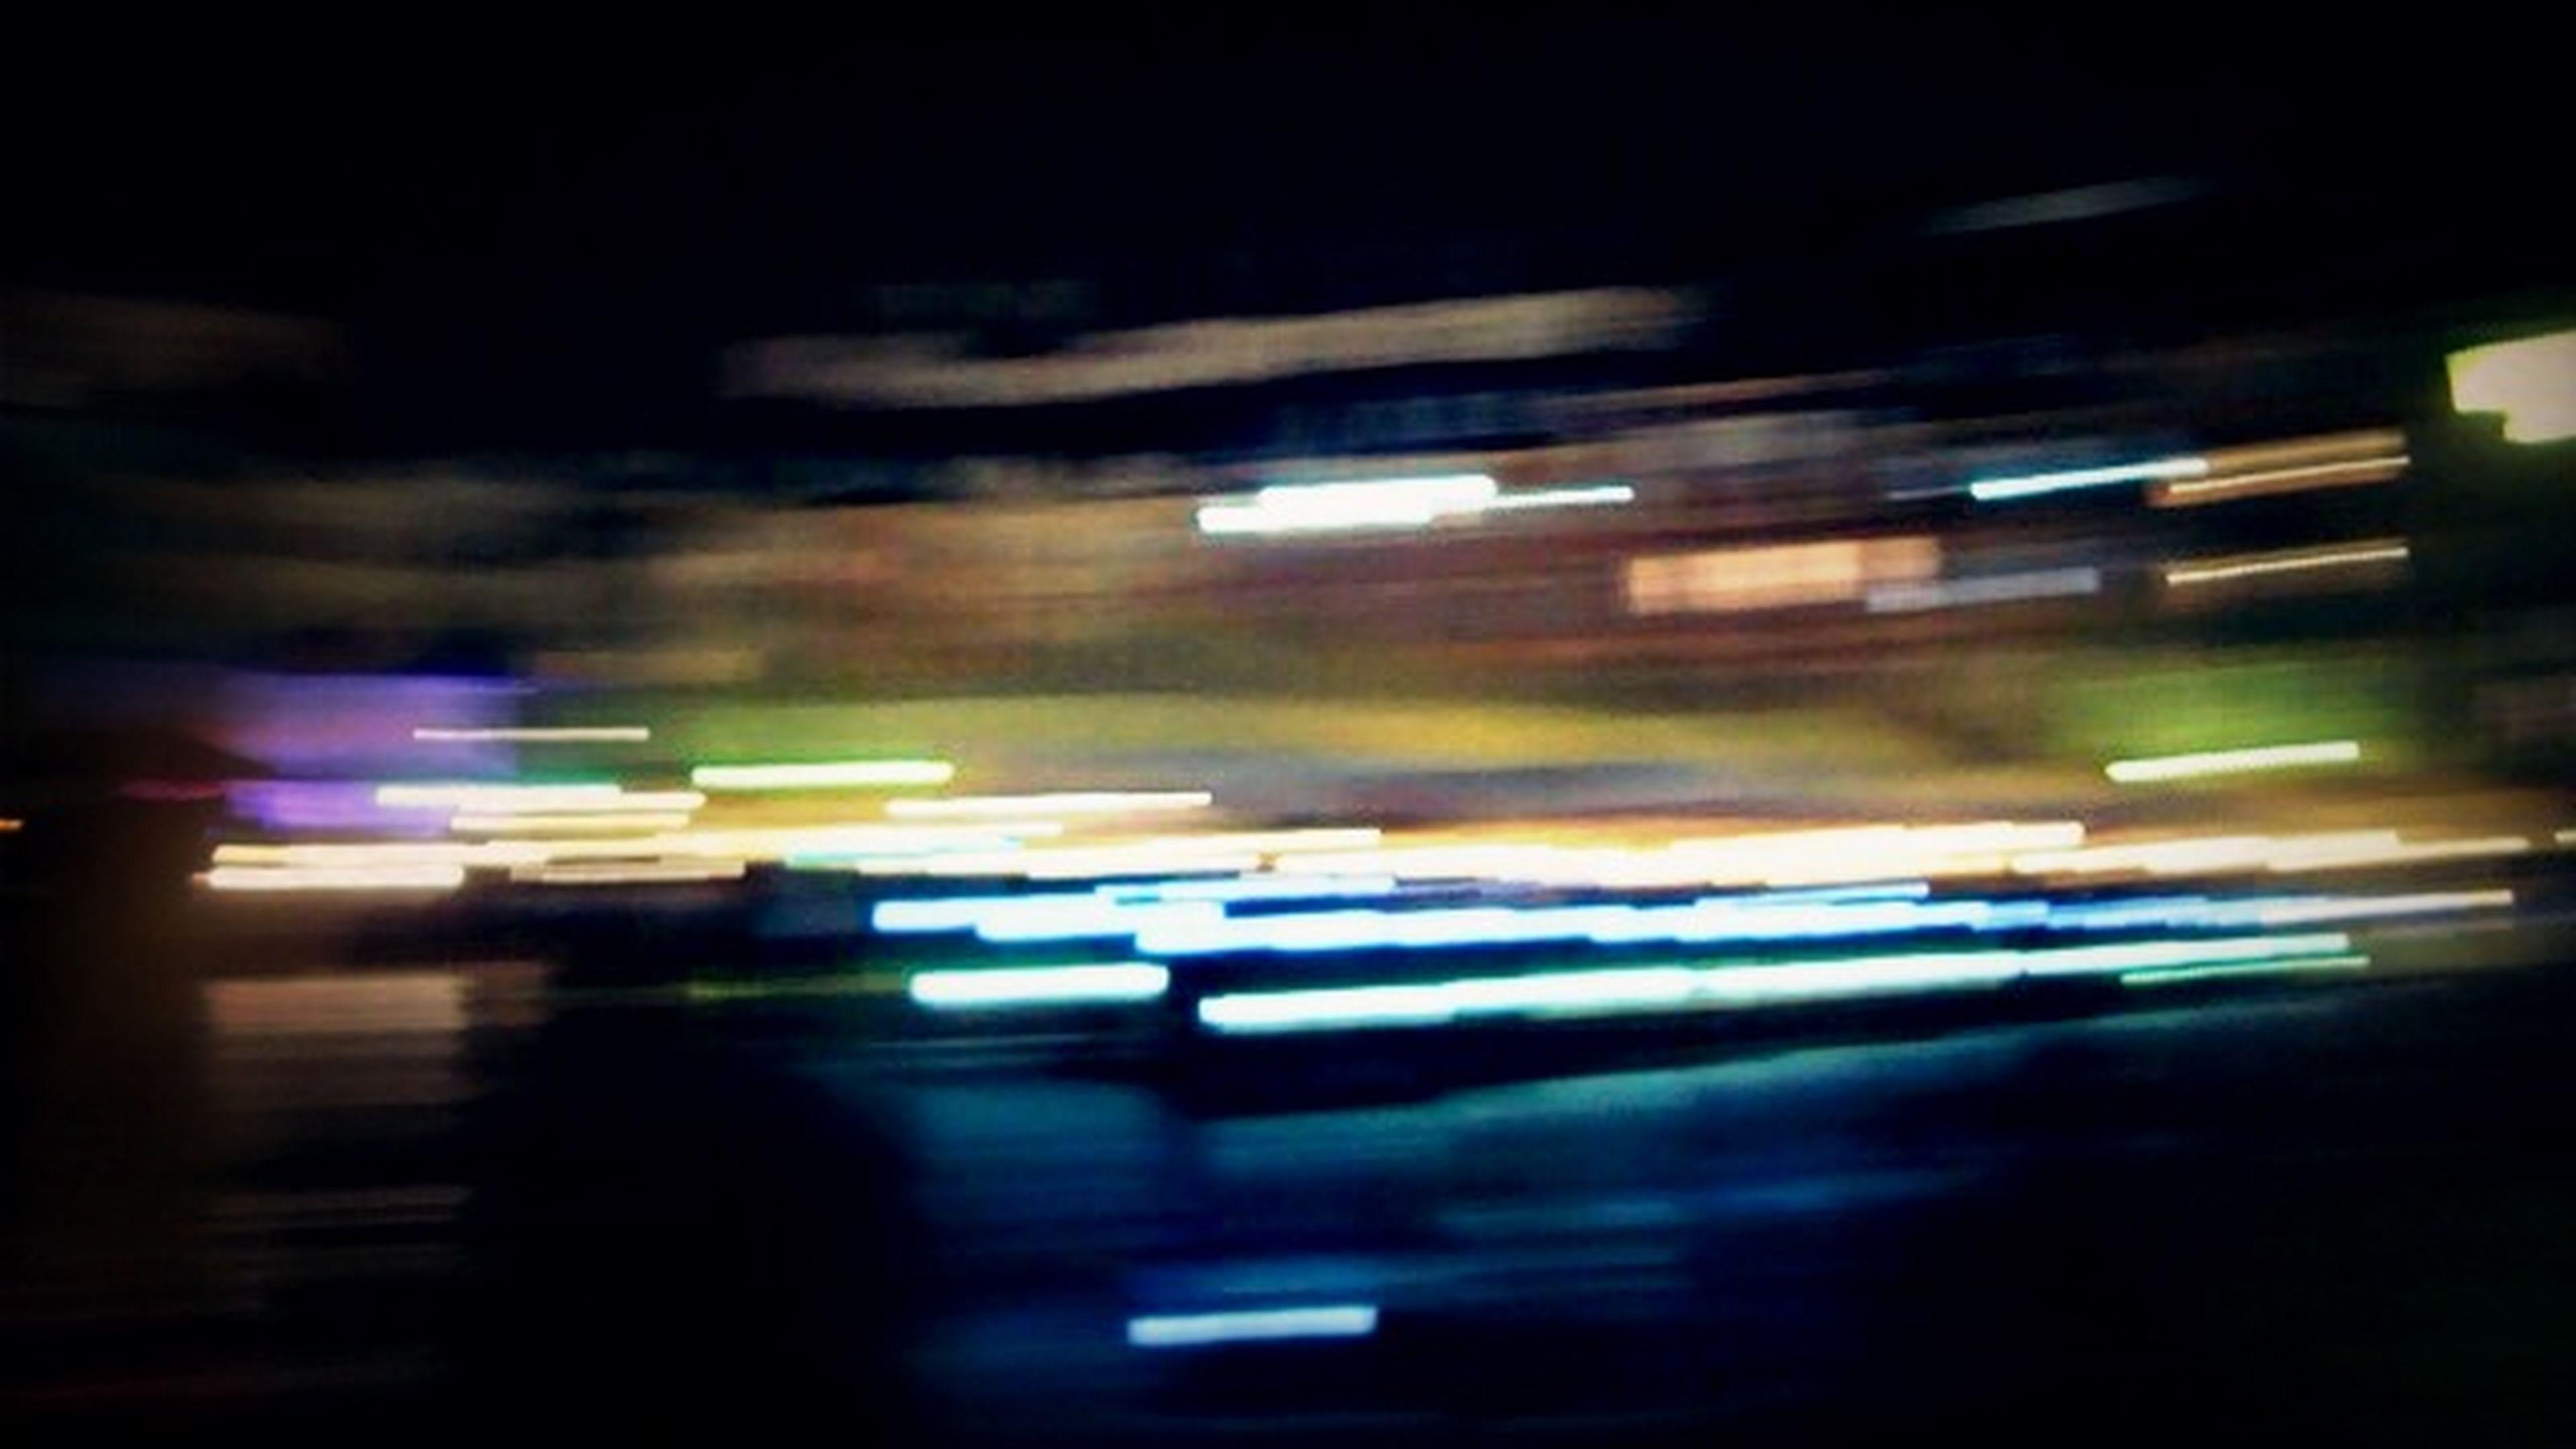 transportation, night, illuminated, car, mode of transport, land vehicle, street, blurred motion, on the move, road, motion, defocused, city, rain, traffic, travel, wet, indoors, speed, city life